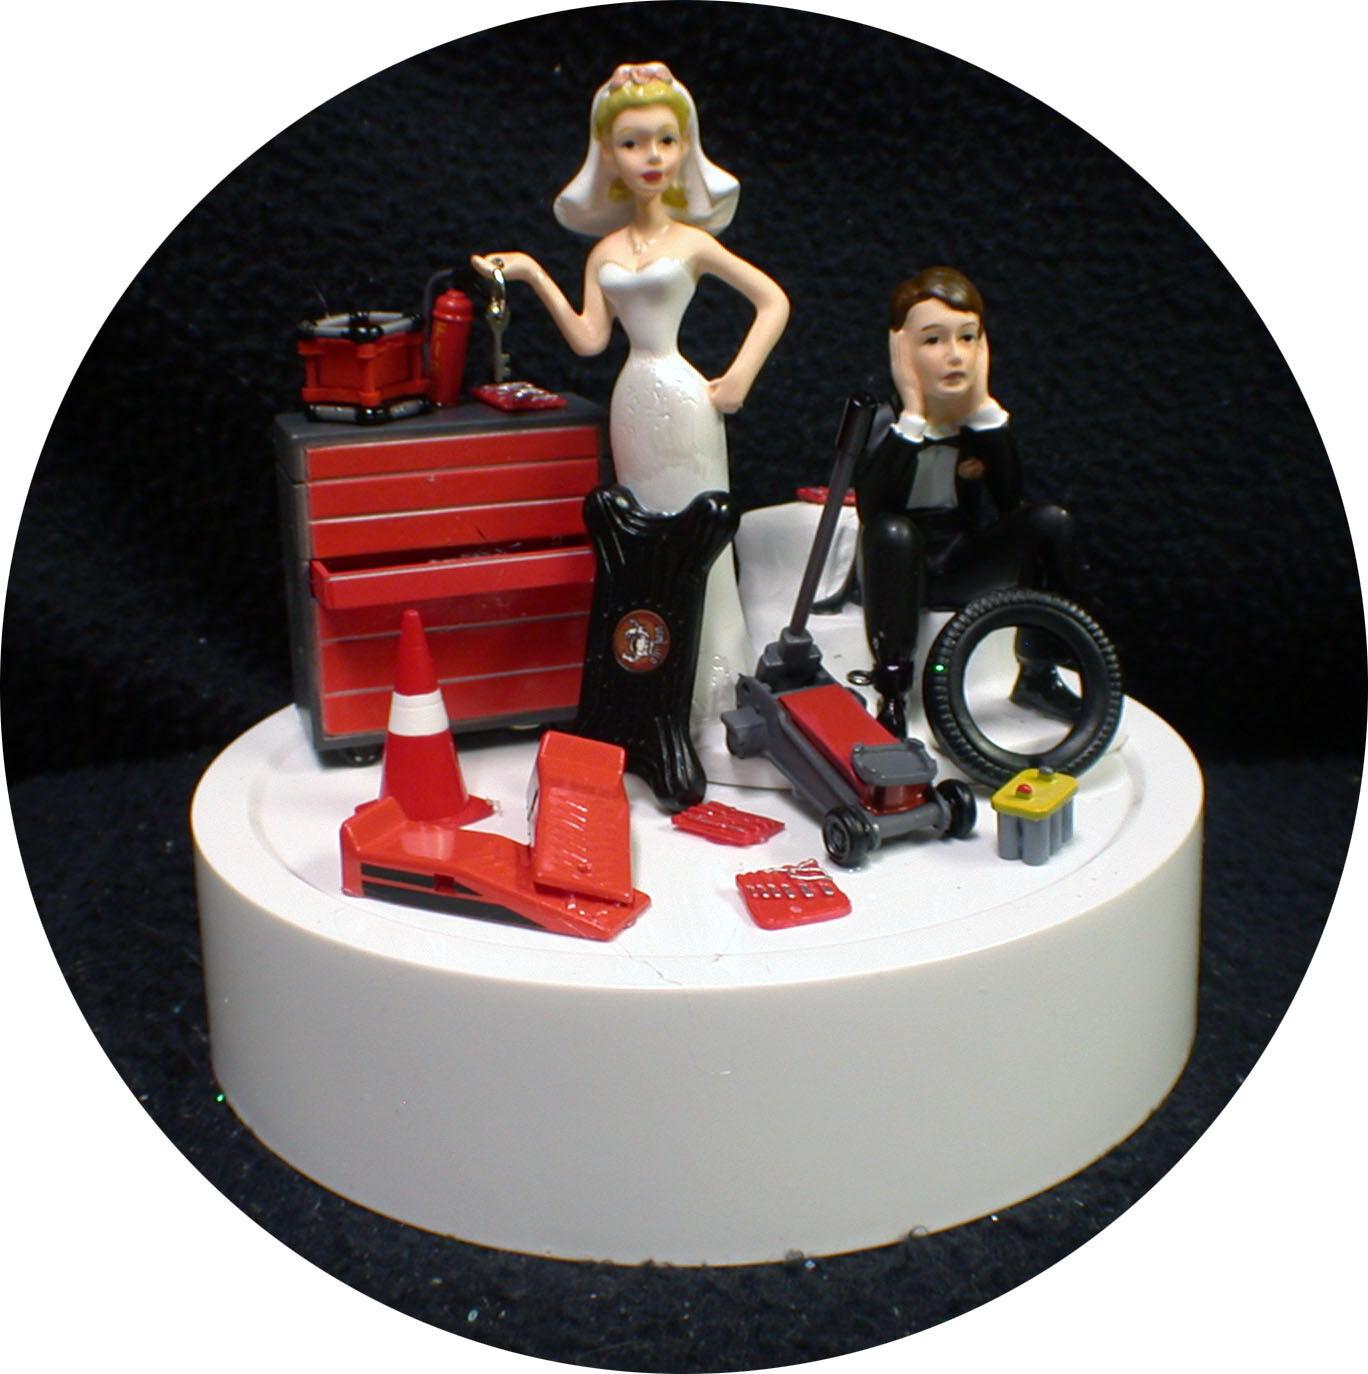 Car AUTO MECHANIC Wedding Cake Topper Groom top Tool Nascar racing Man Cave Fun